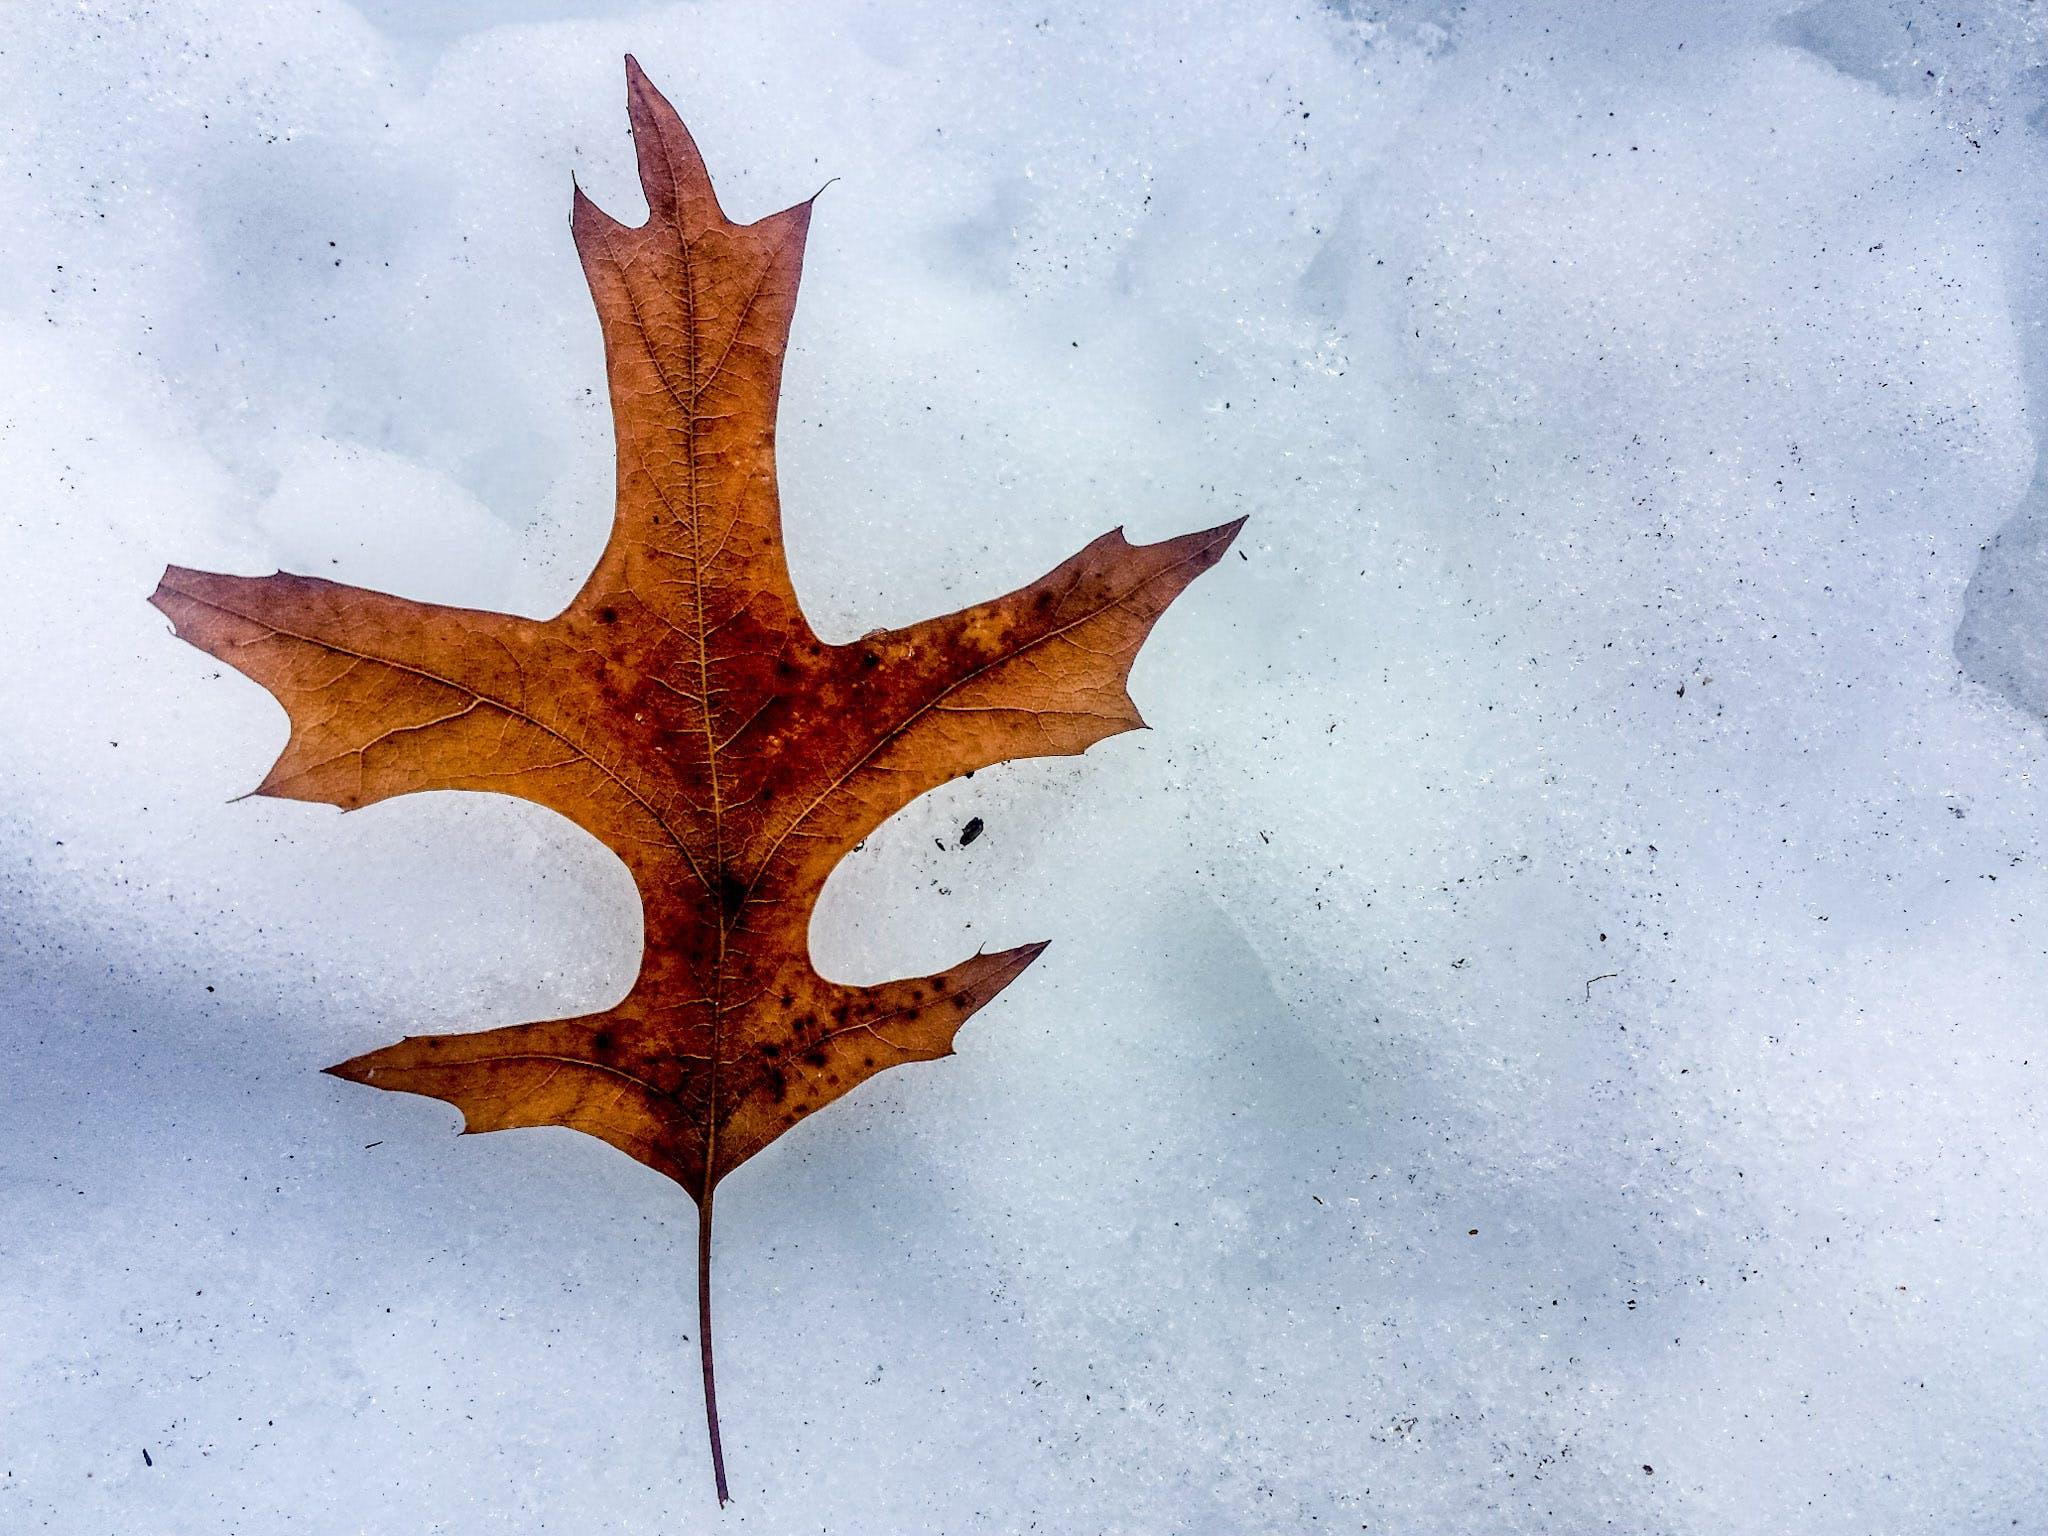 Free stock photo of dried leaf, oak leaf, snow